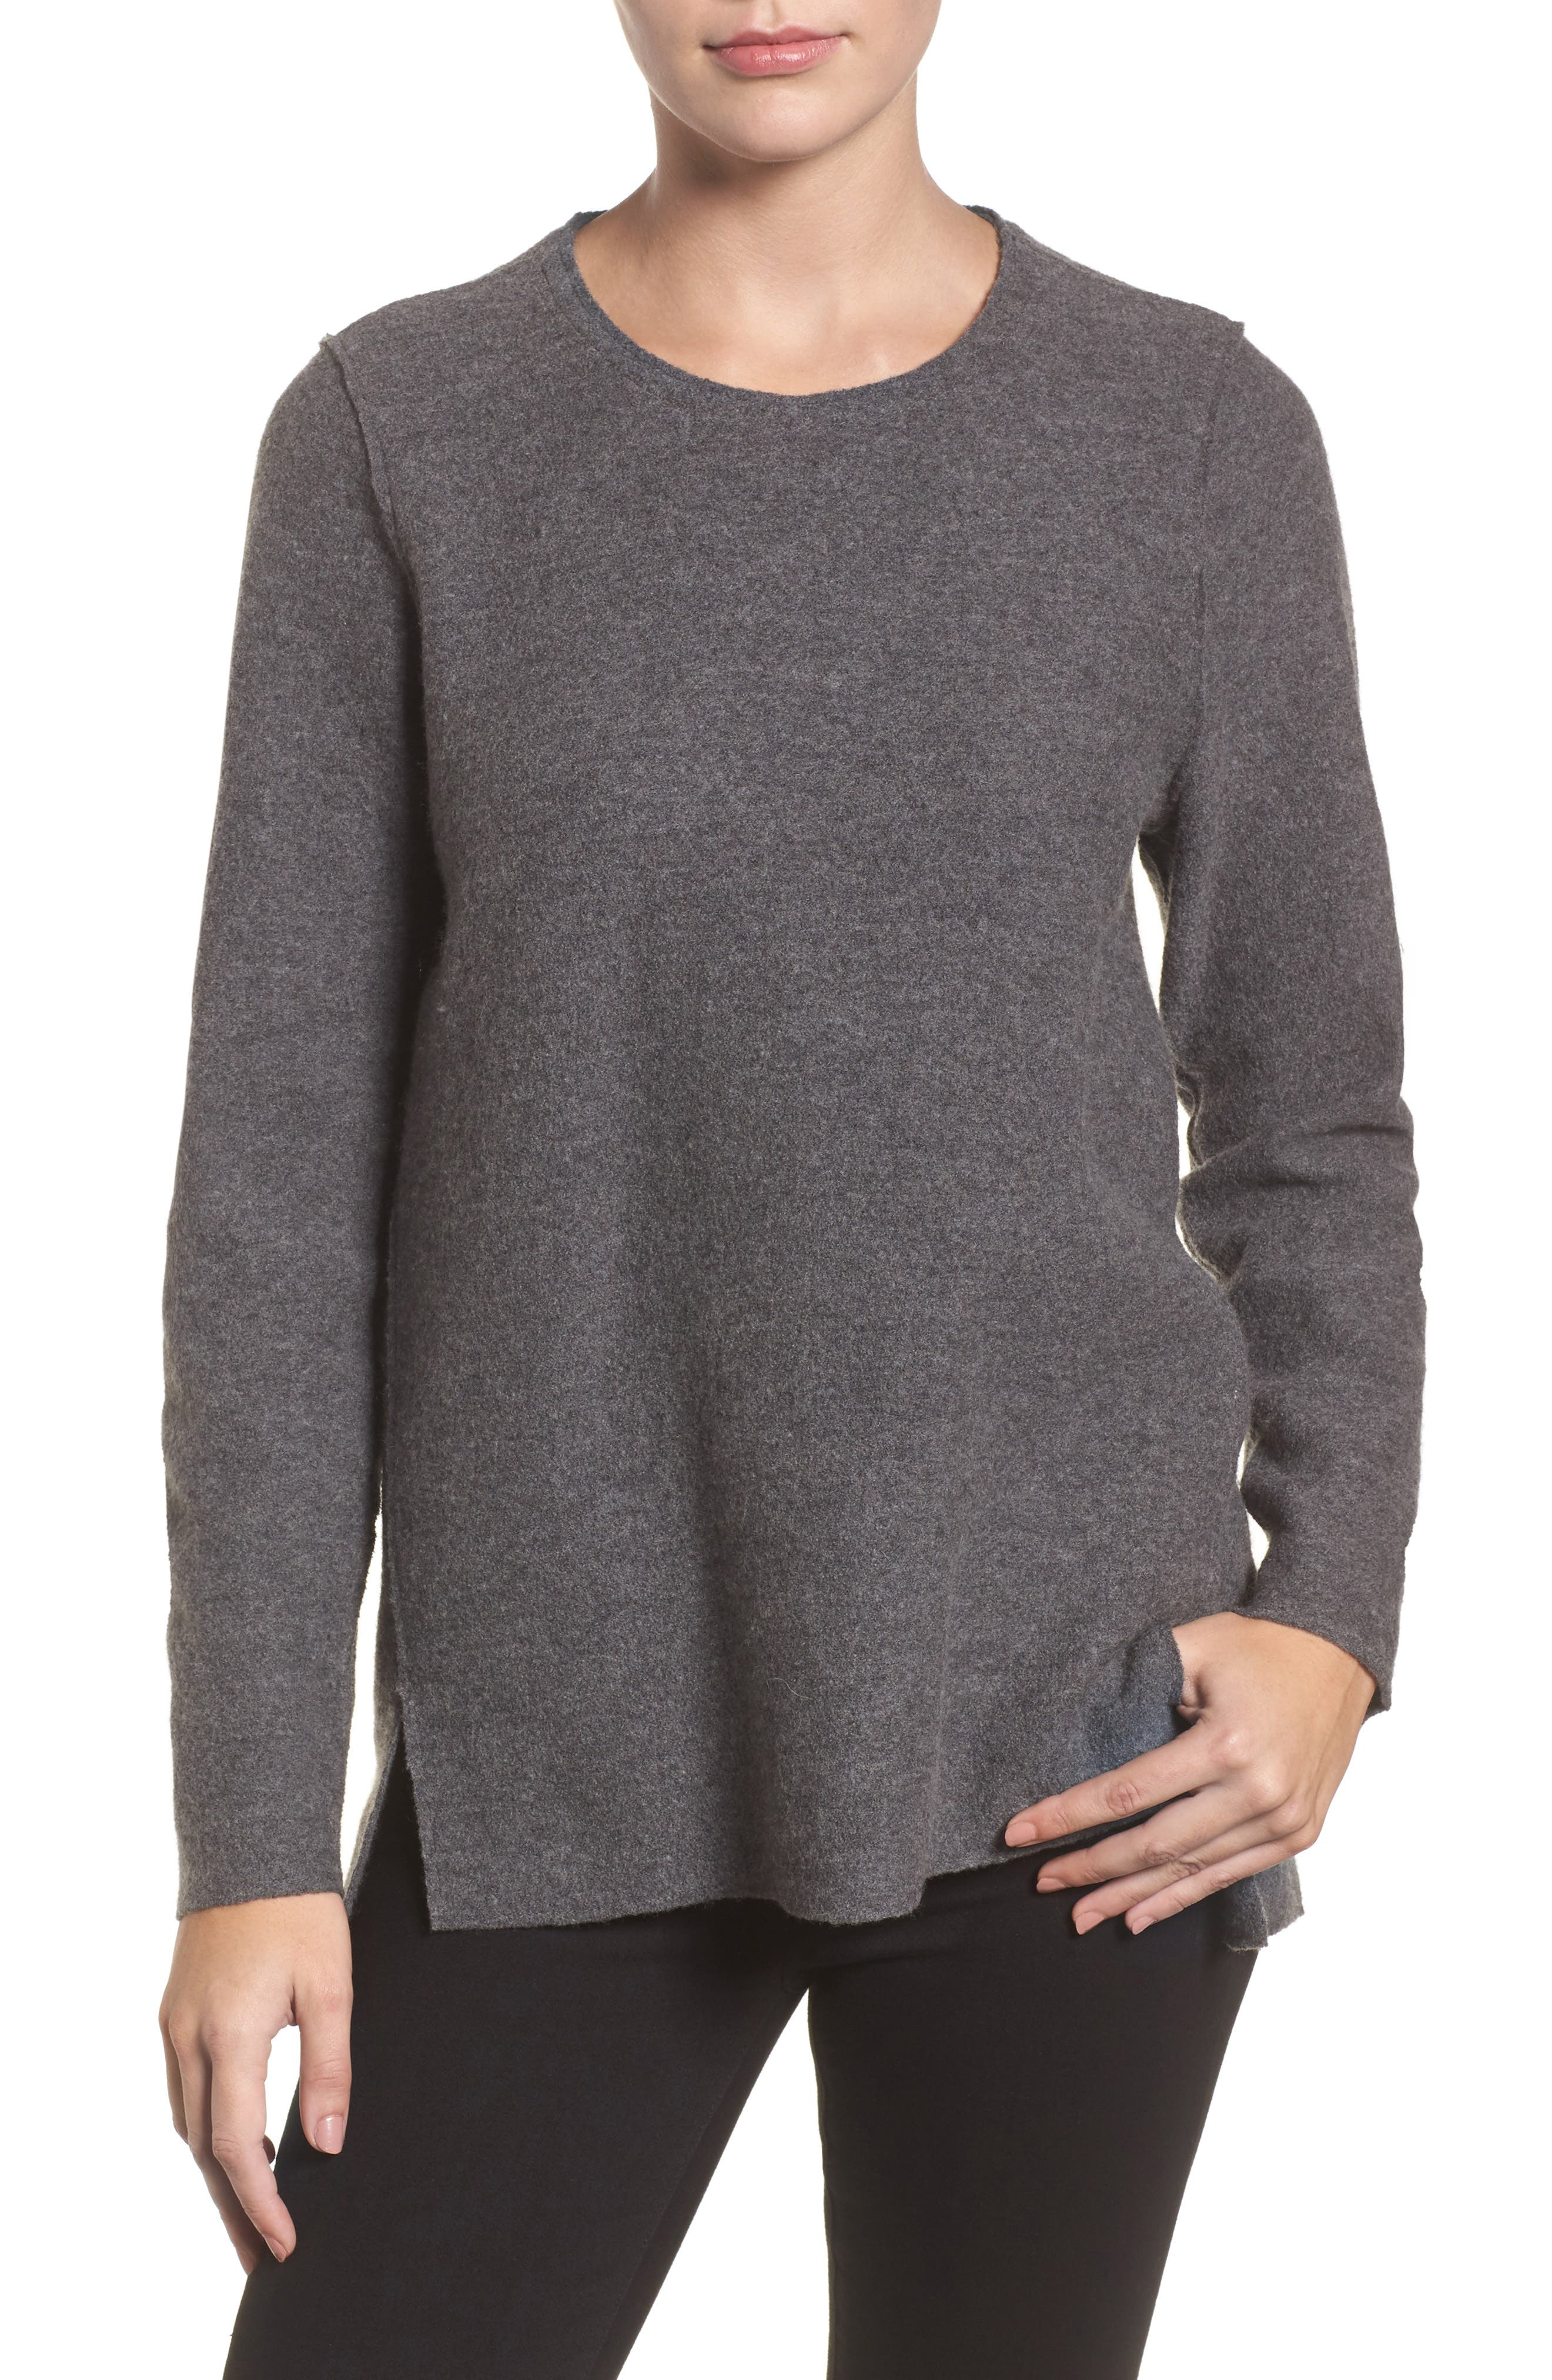 Alternate Image 1 Selected - Eileen Fisher Boiled Merino Wool Top (Regular & Petite)